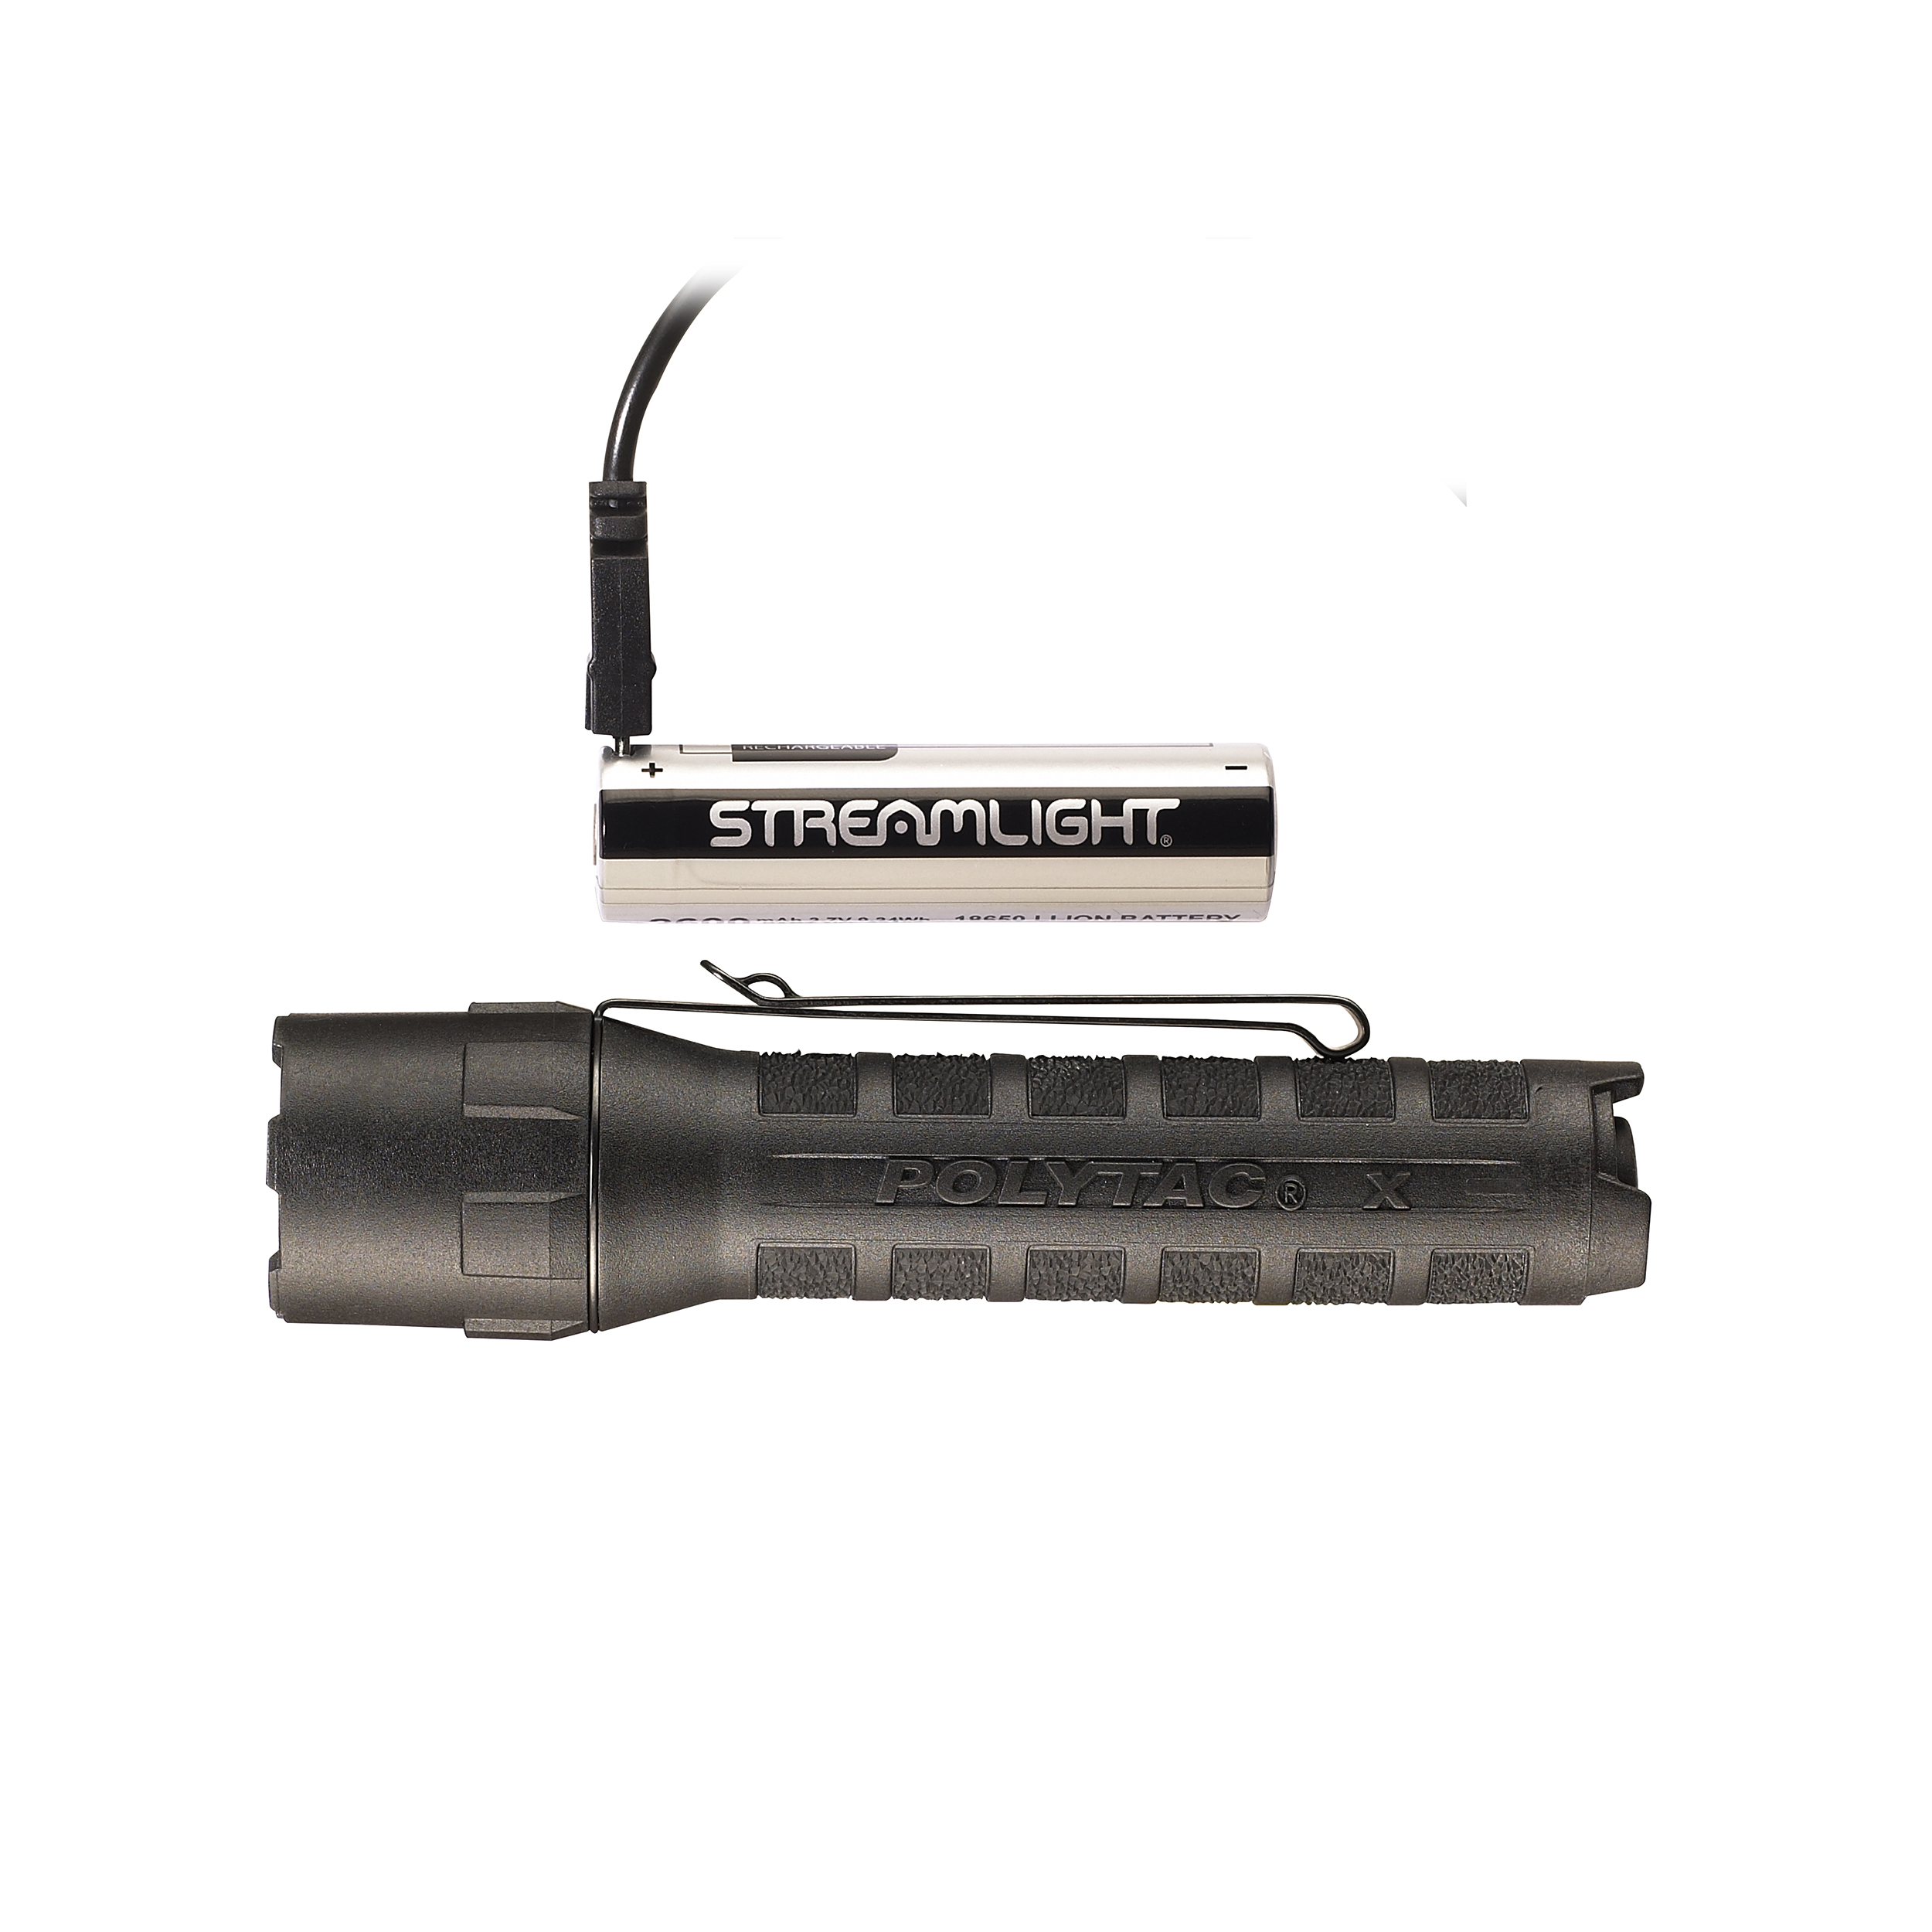 Streamlight 88610 Polytac X USB Rechargeable 600 Lumen LED Handheld Flashlight